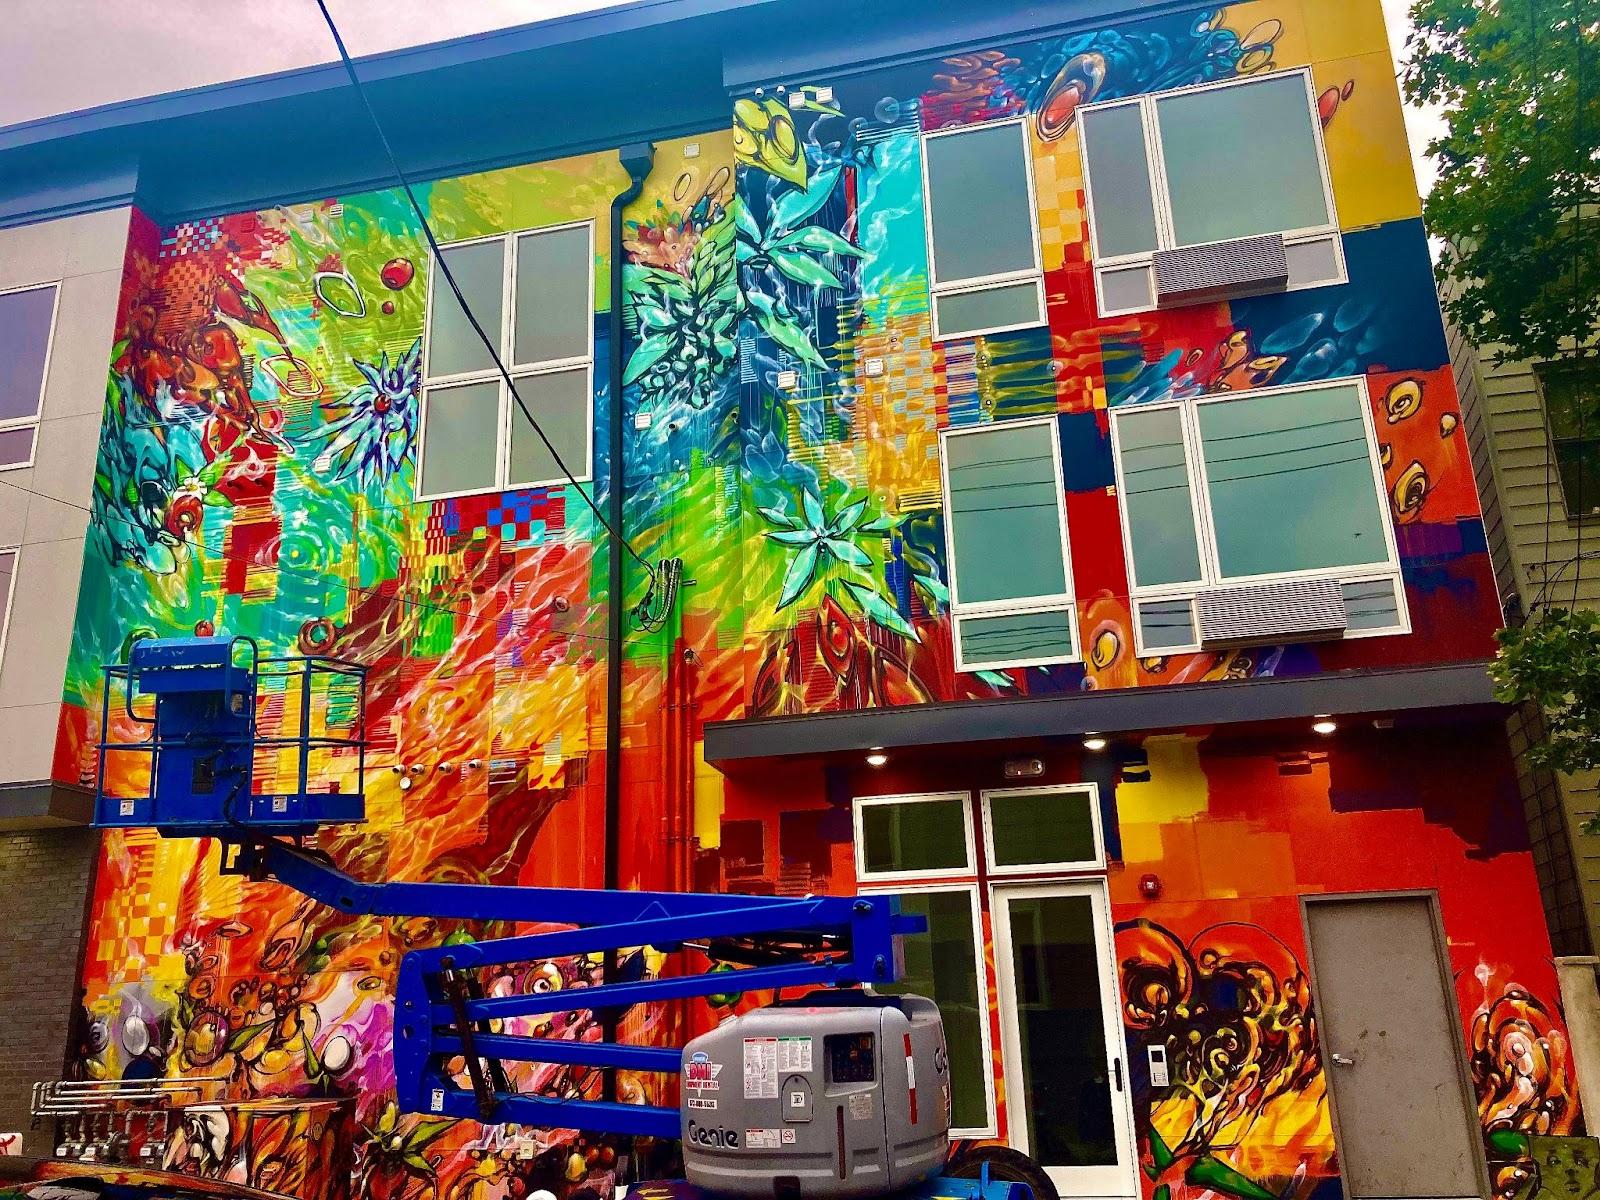 Inside Look at Jersey City's Burgeoning Street Art. Work-in-progress shot of Mr. Mustart's mural at High St. & Summit Ave. Photo by Vittoria Benzine.